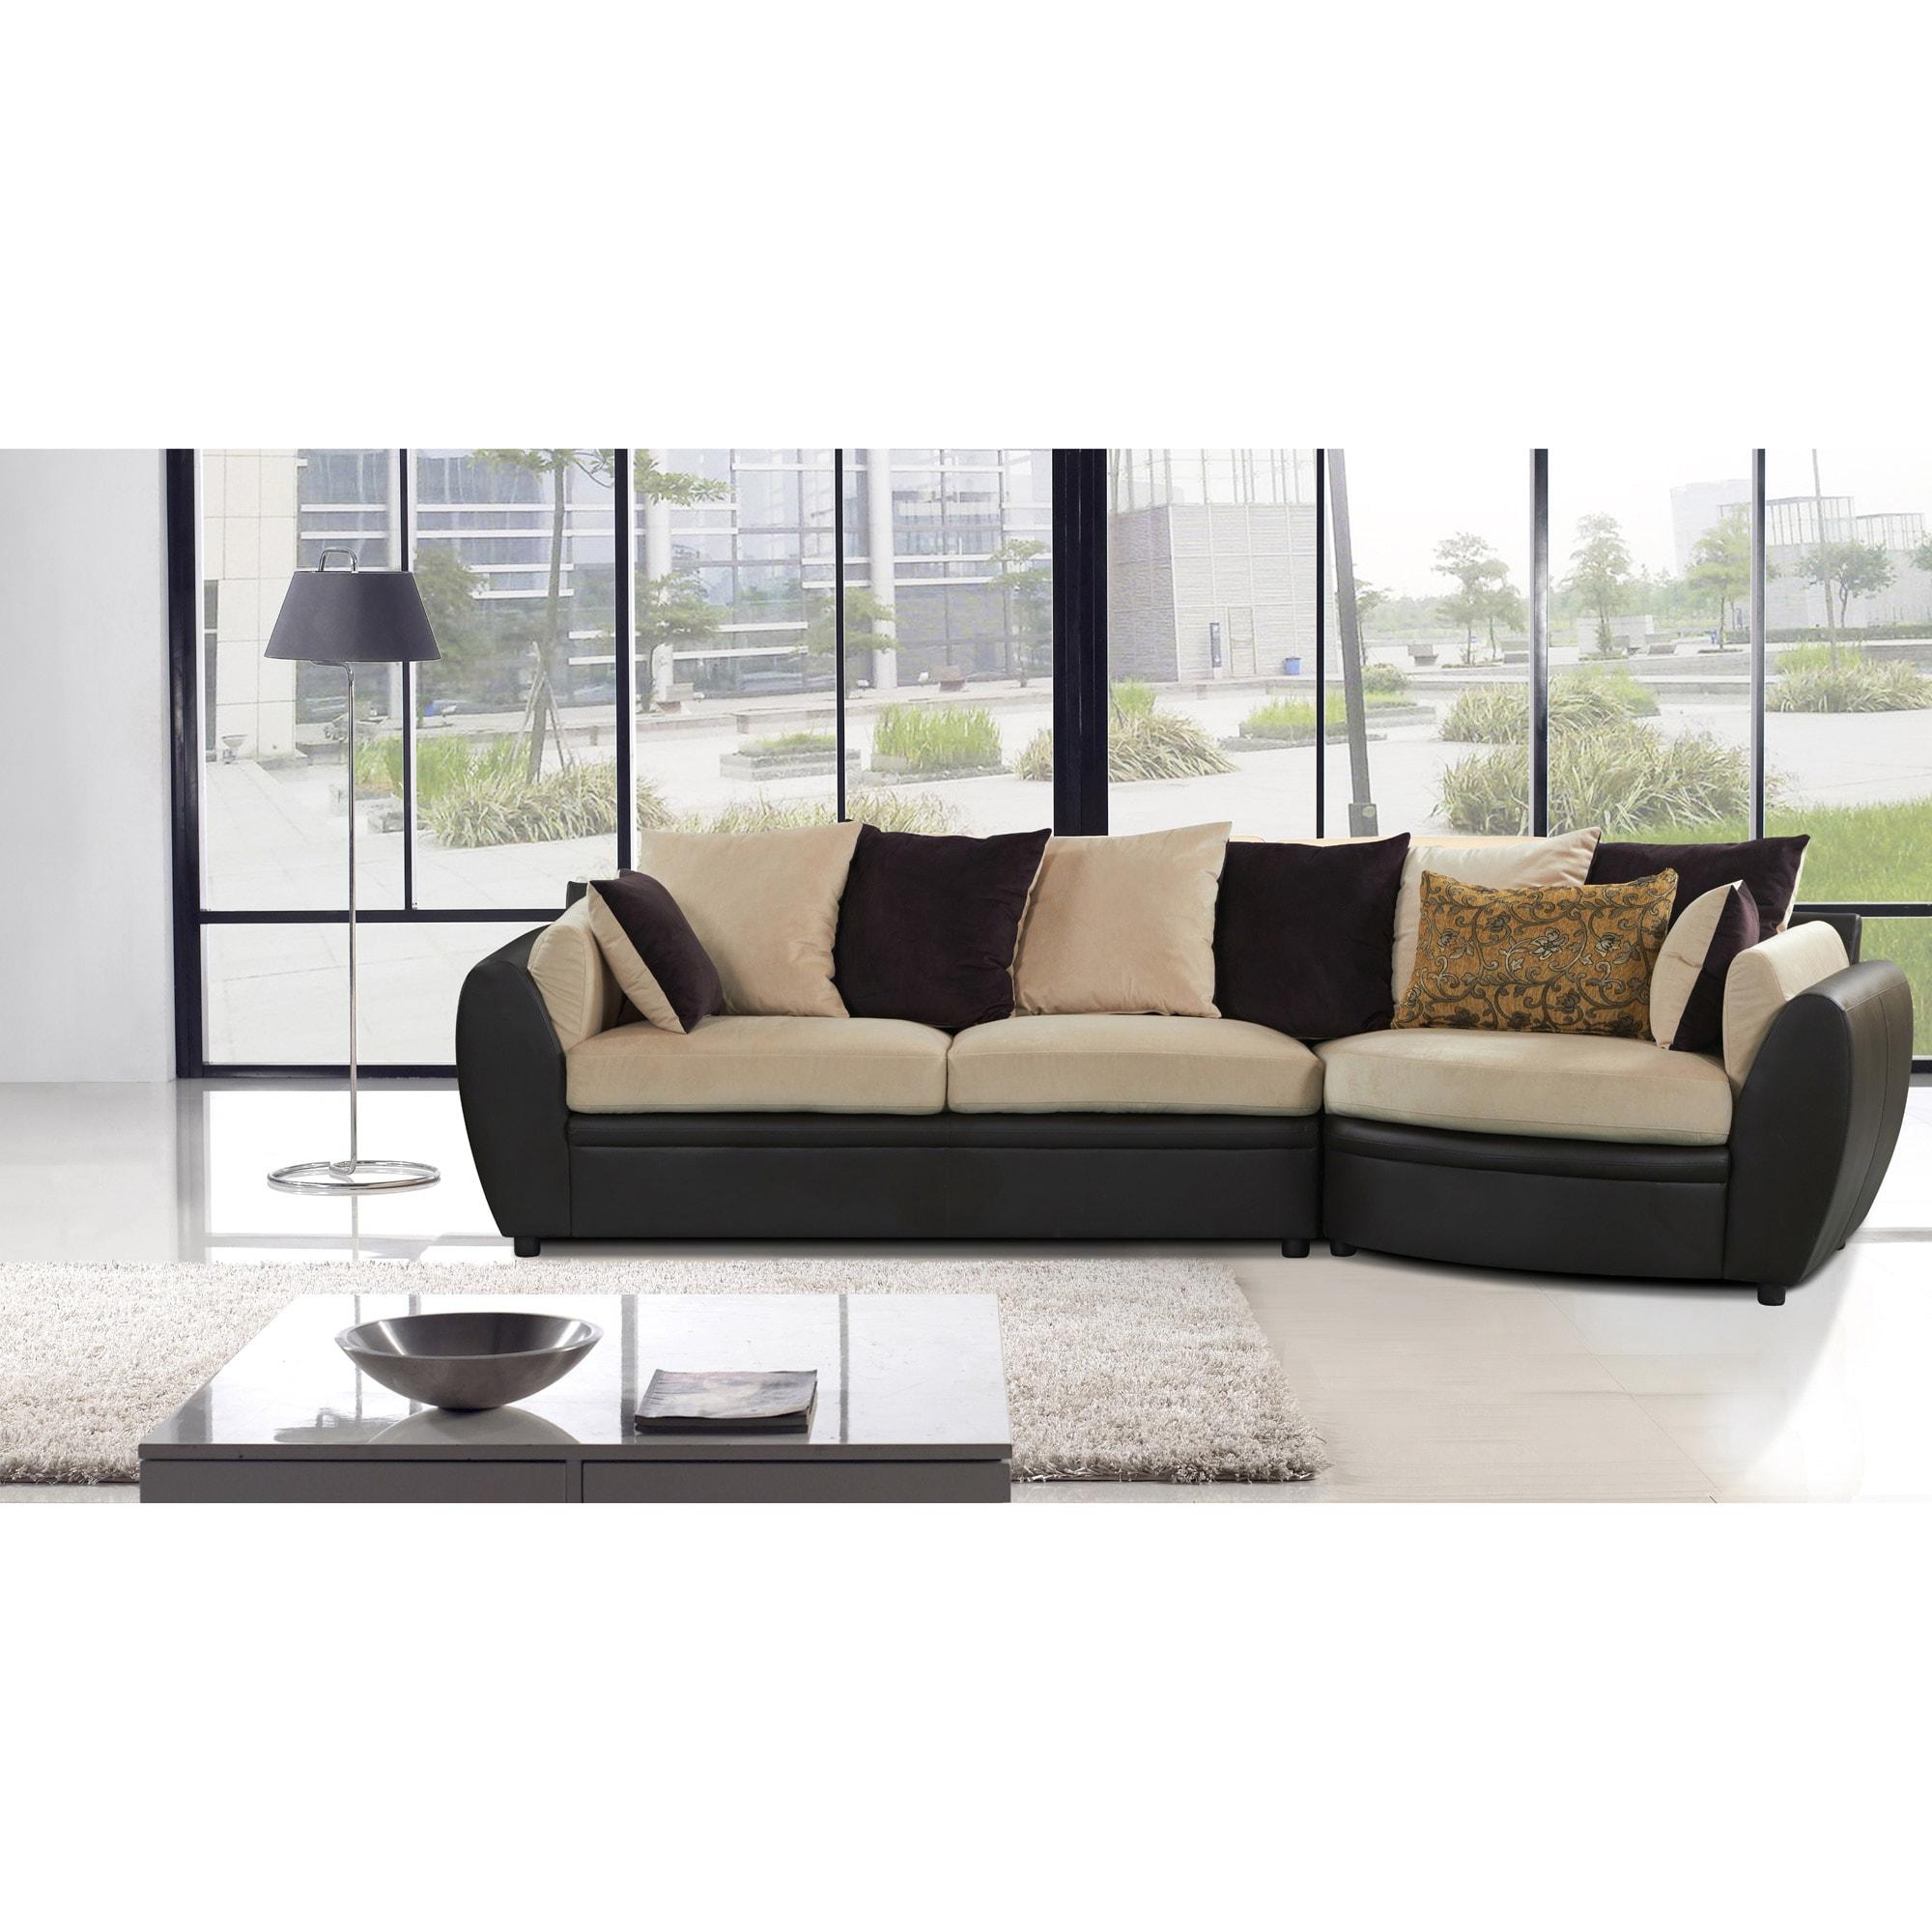 Loreta 2-pc Sectional Sofa Set - Free Shipping Today - Overstock ...